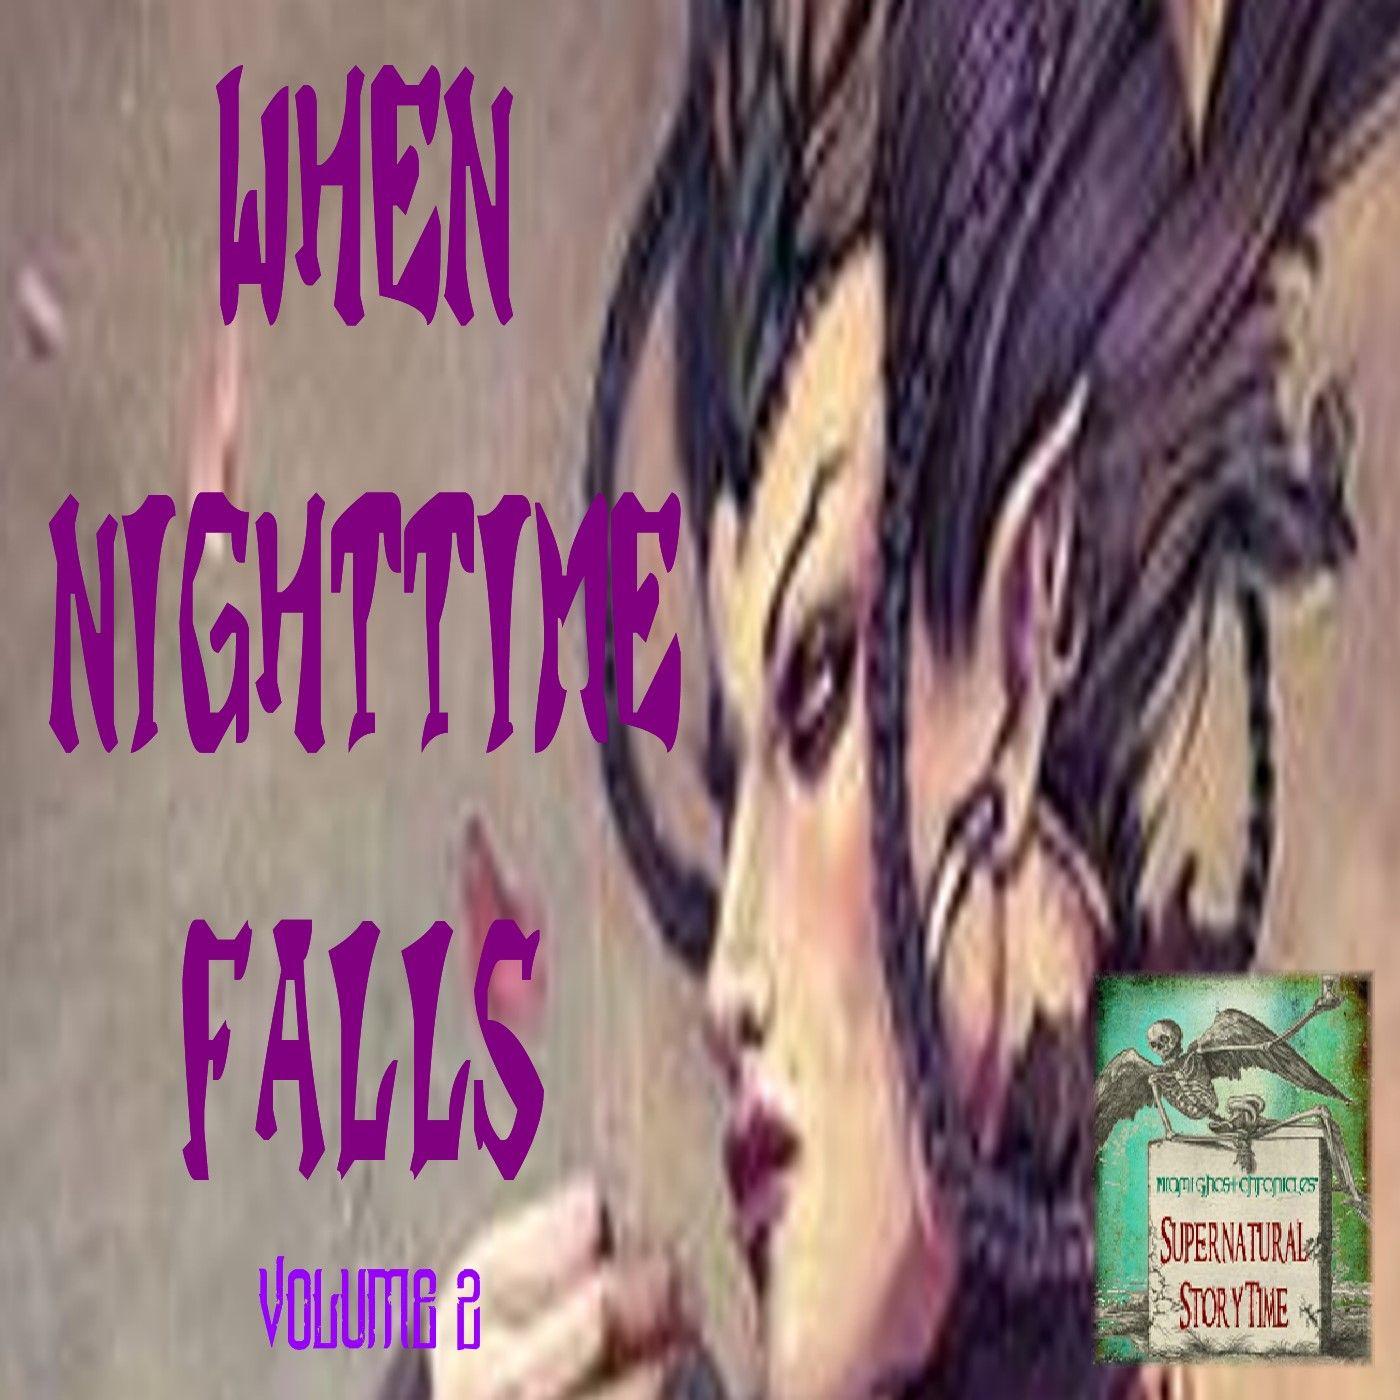 When Nighttime Falls | Volume 2 | Podcast E148